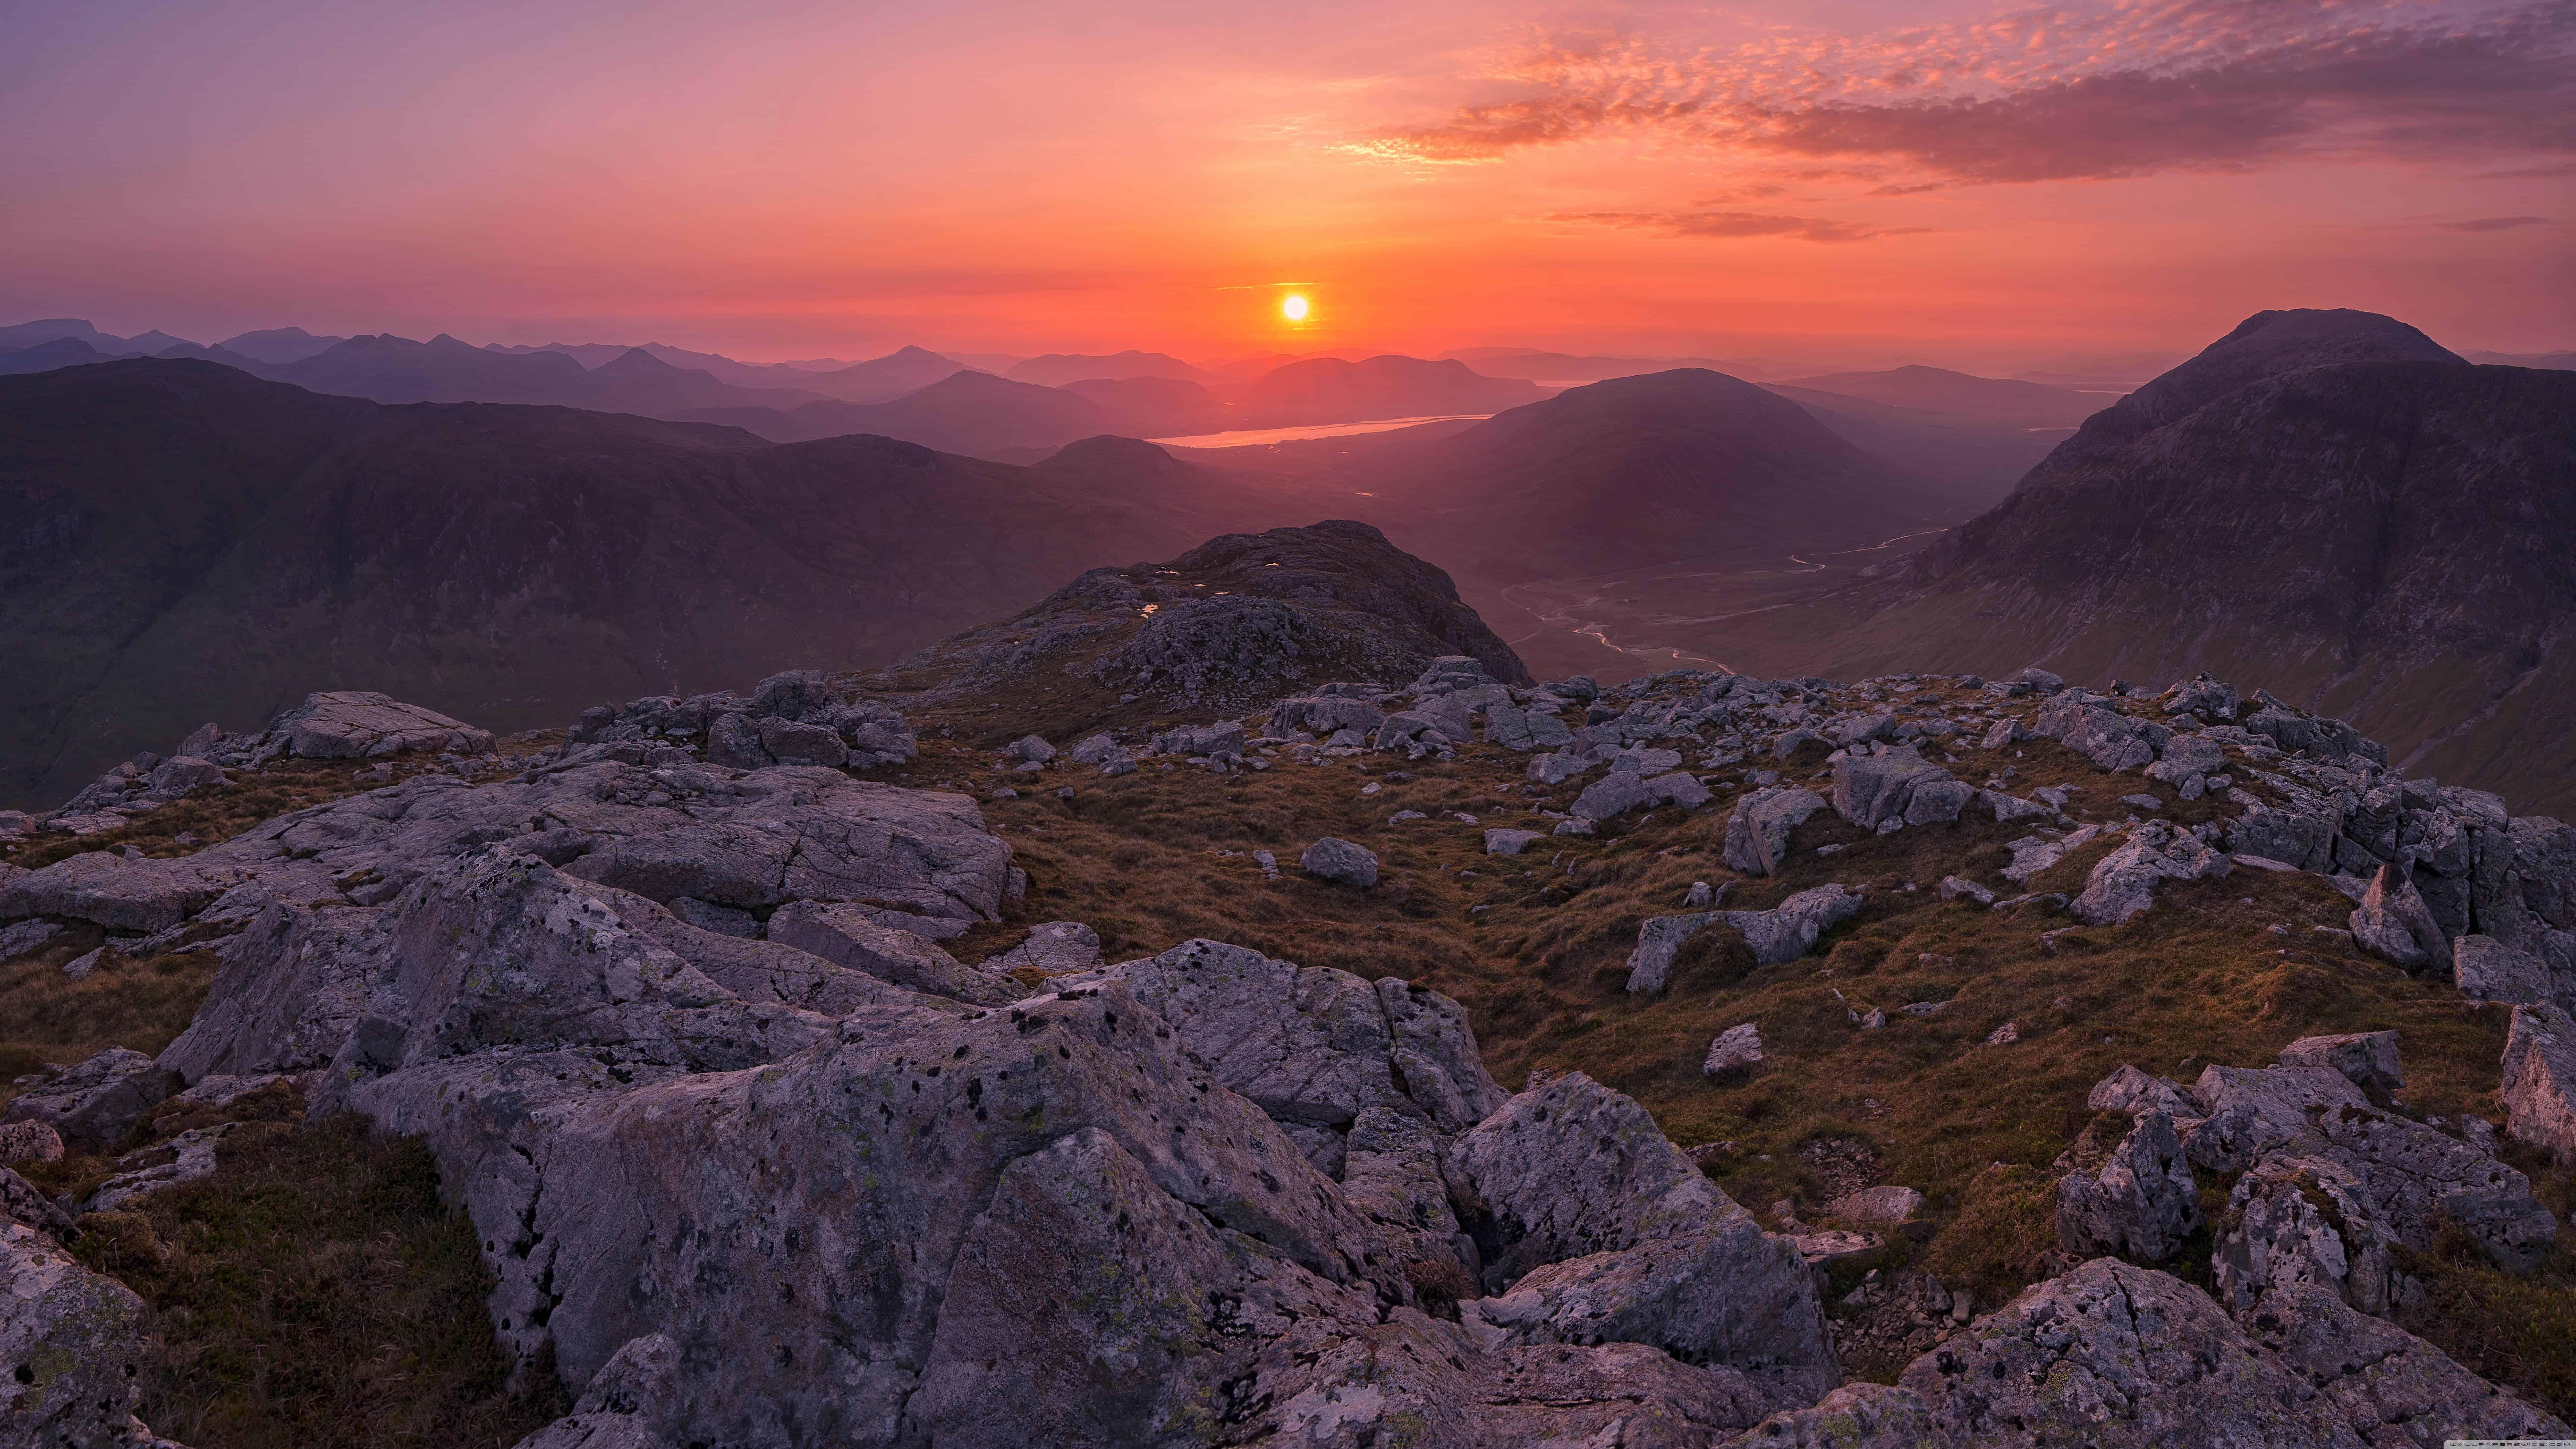 sunrise over west highlands buachaille etive beag glencoe scotland uhd 8k wallpaper